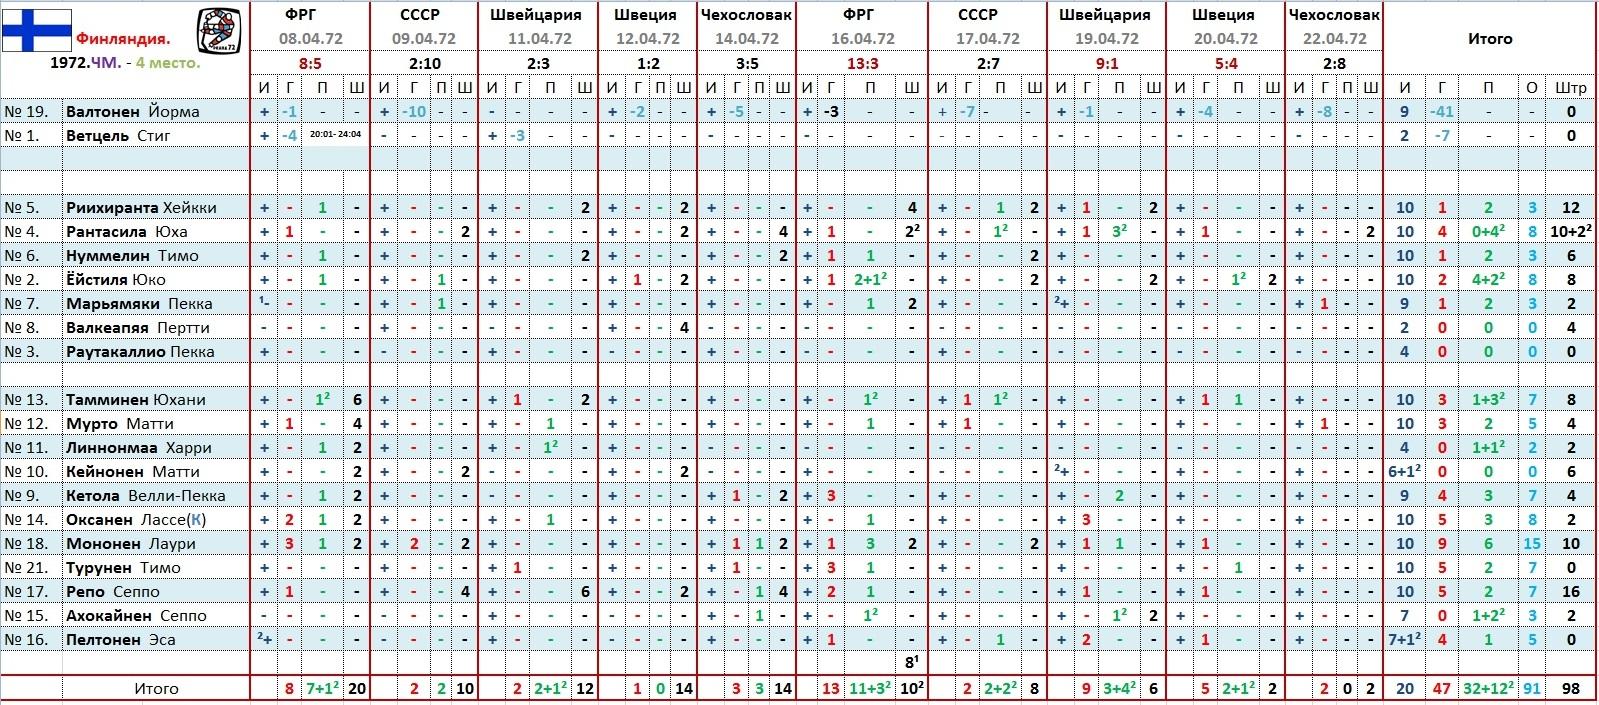 Финляндия. ЧМ 1972.статистика.JPG